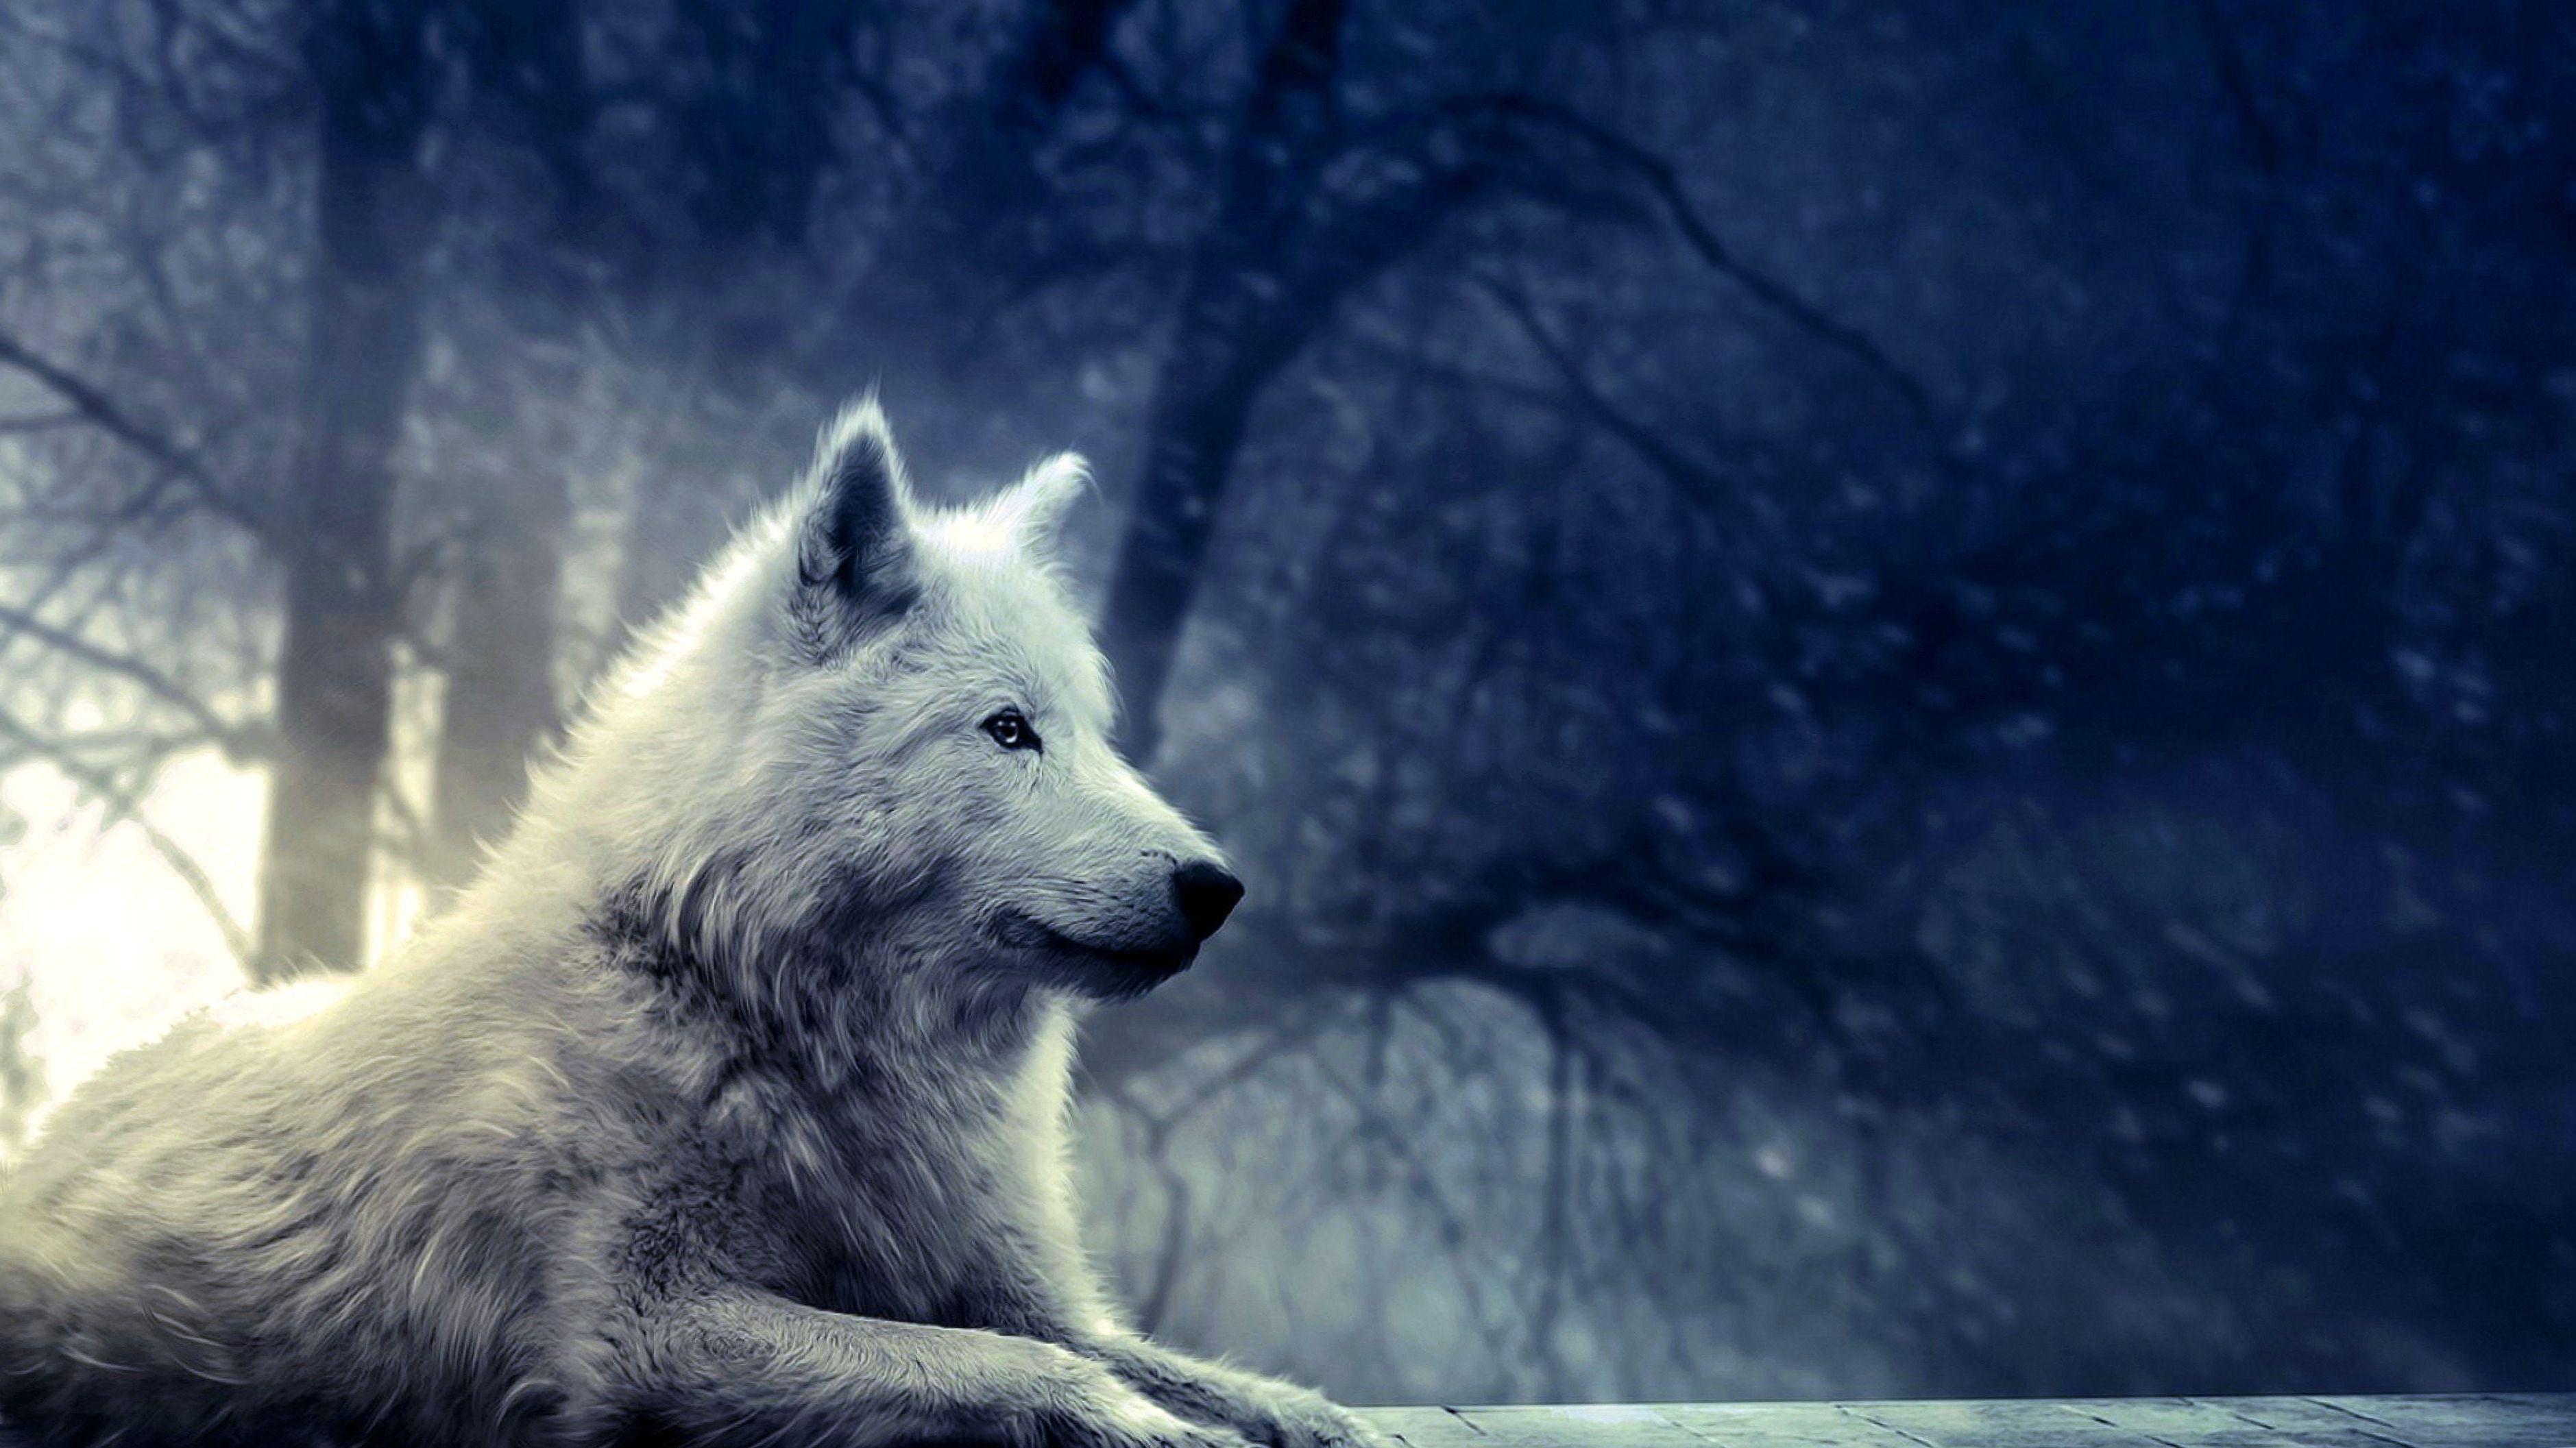 Best Wolf Wallpapers 4k Best Wolf Wallpapers 4k Wolf Poster Wolf Wallpaper Fantasy Wolf